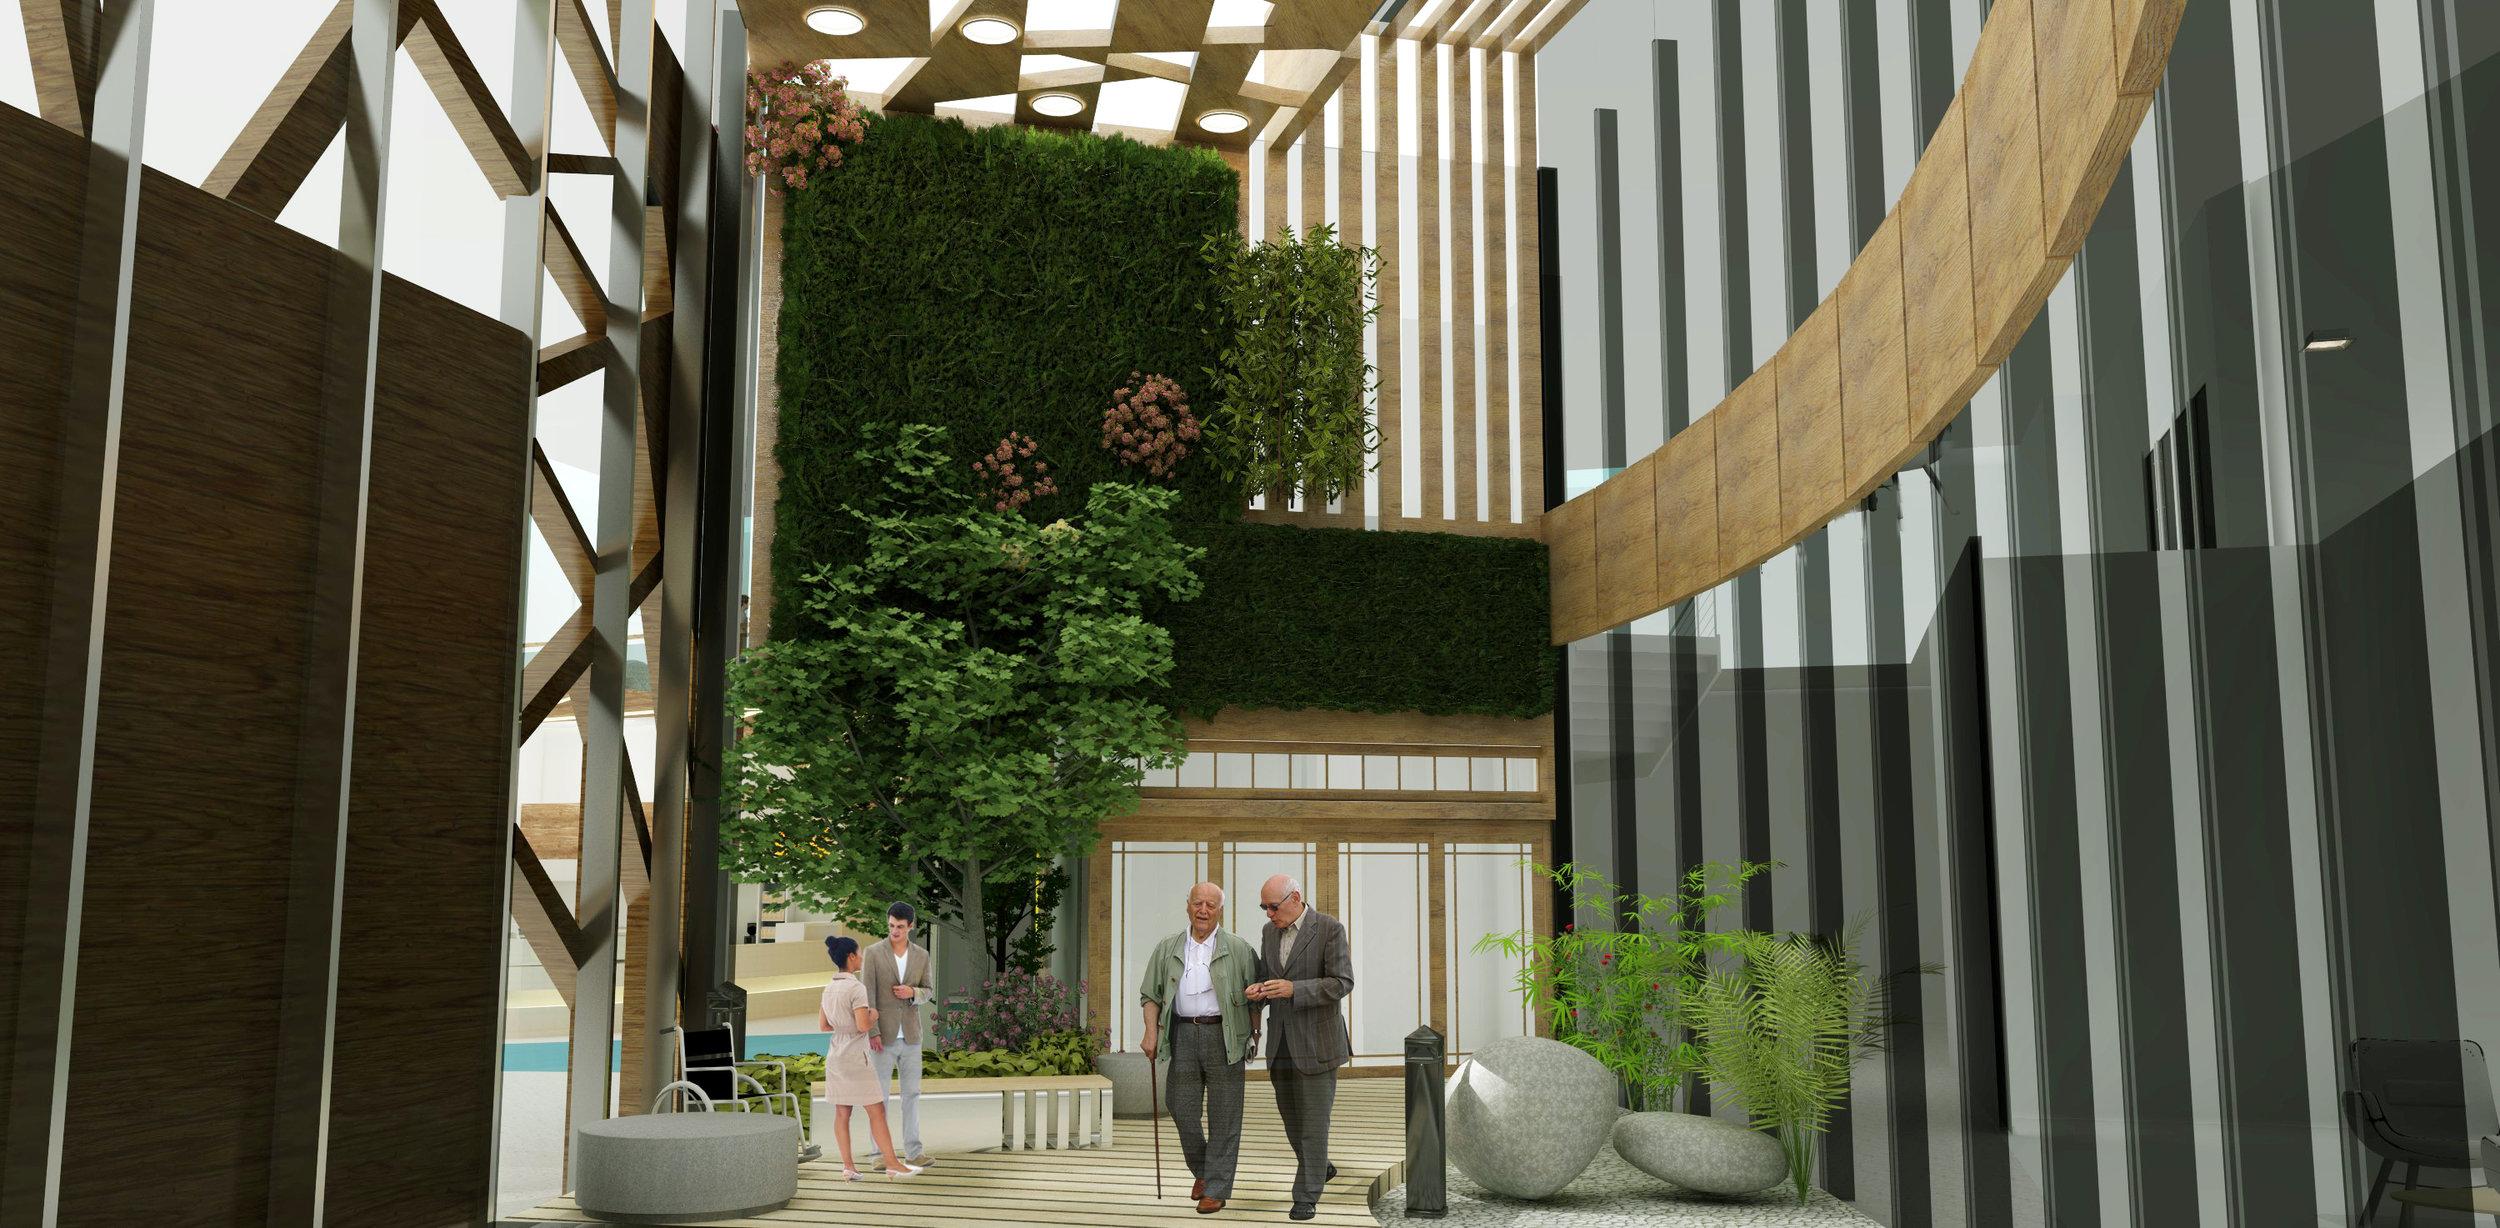 raven-carter-elisabeth-croy-shijun-cui-bayshore-cancer-center-mps-healthcare-interior-design-project_17023493223_o.jpg